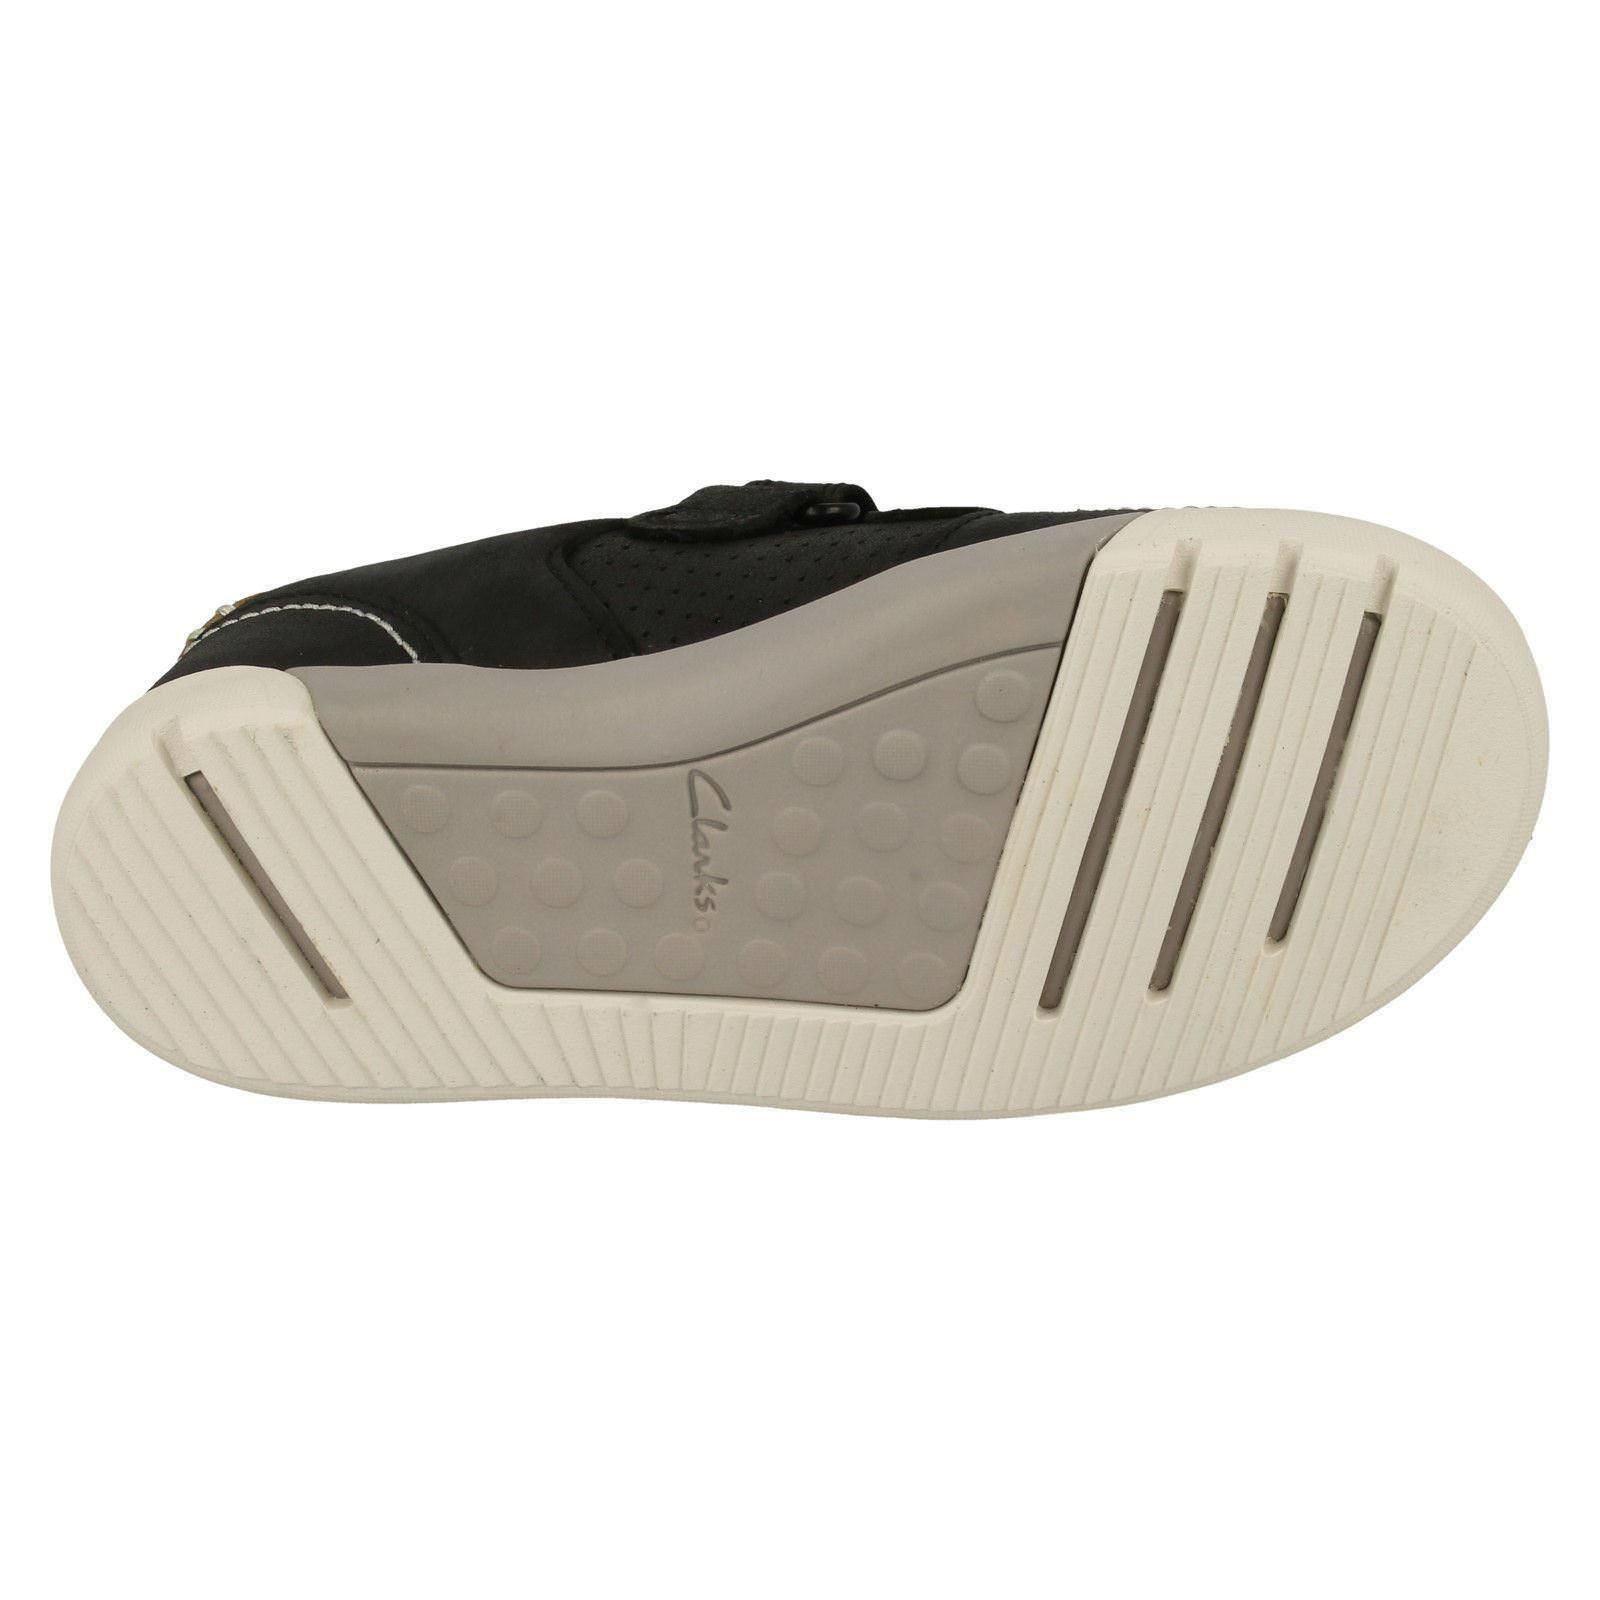 Clarks Mini blancoo Zapato Informal de Cuero blancoo Mini Ezra 6a6f16